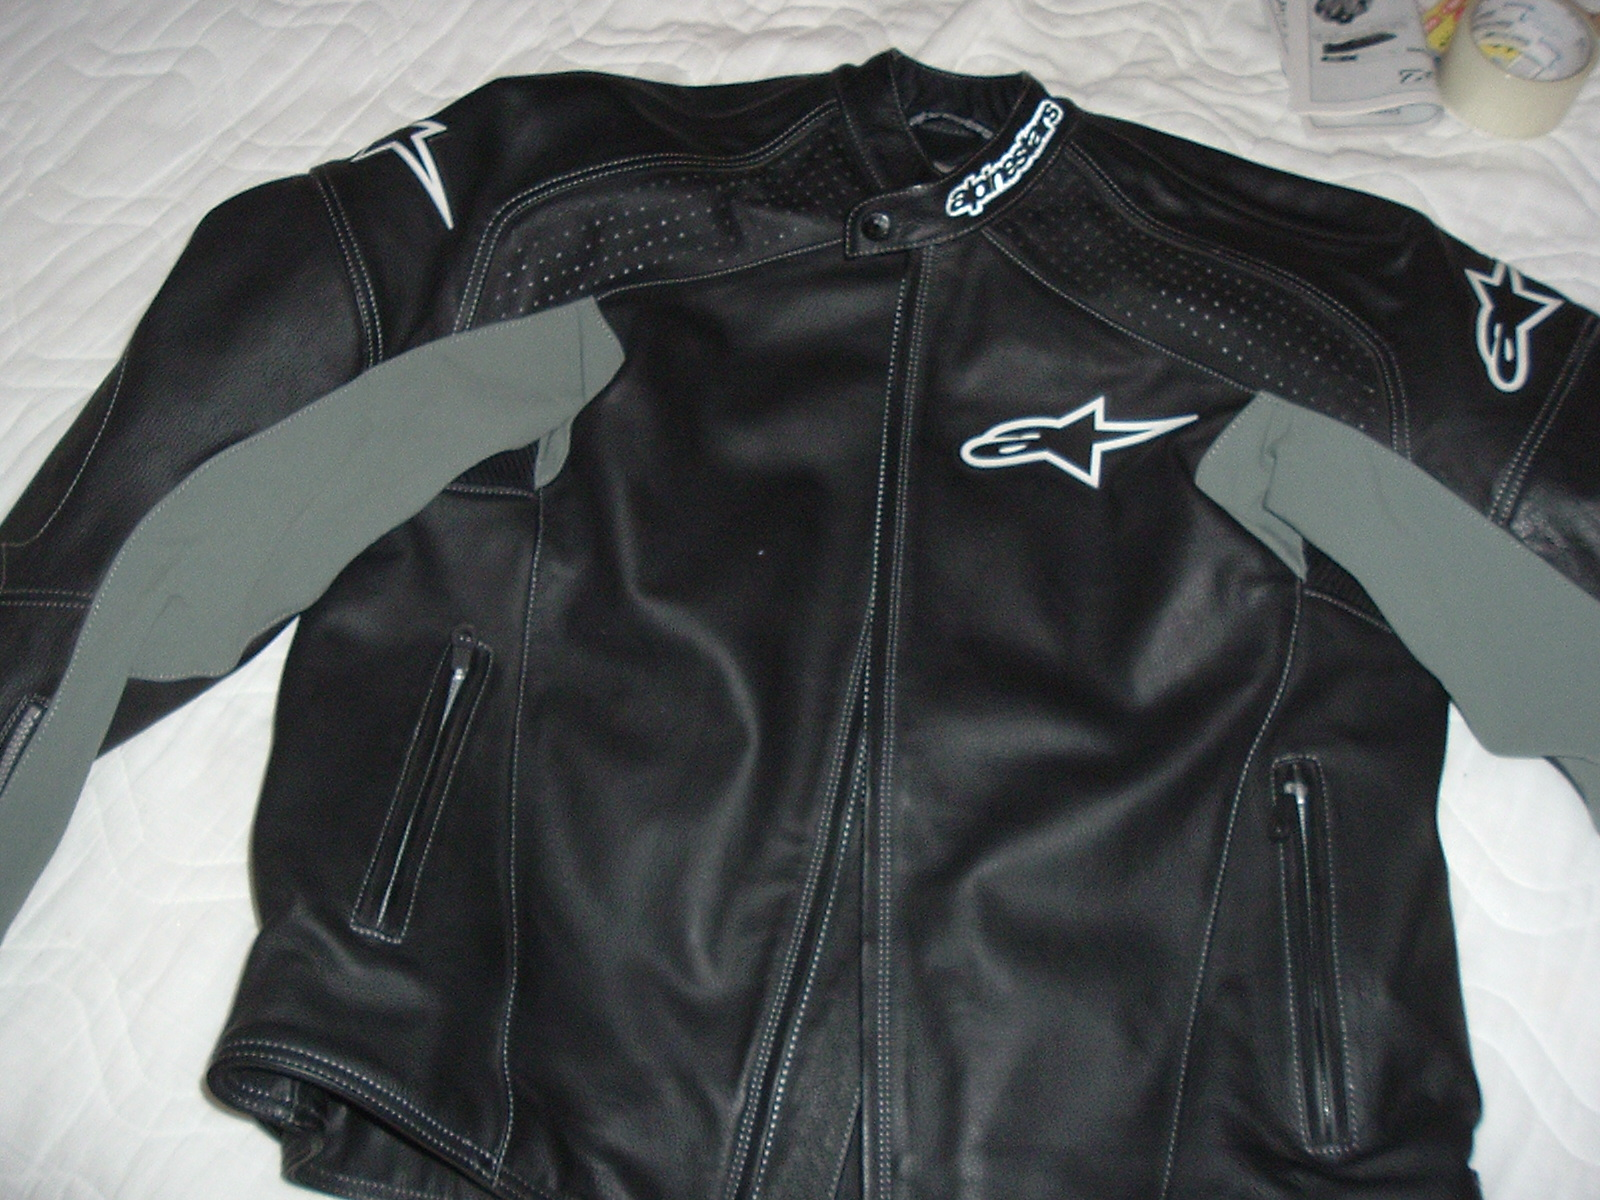 Alpinestars TZ-1 Leather Jacket - Red